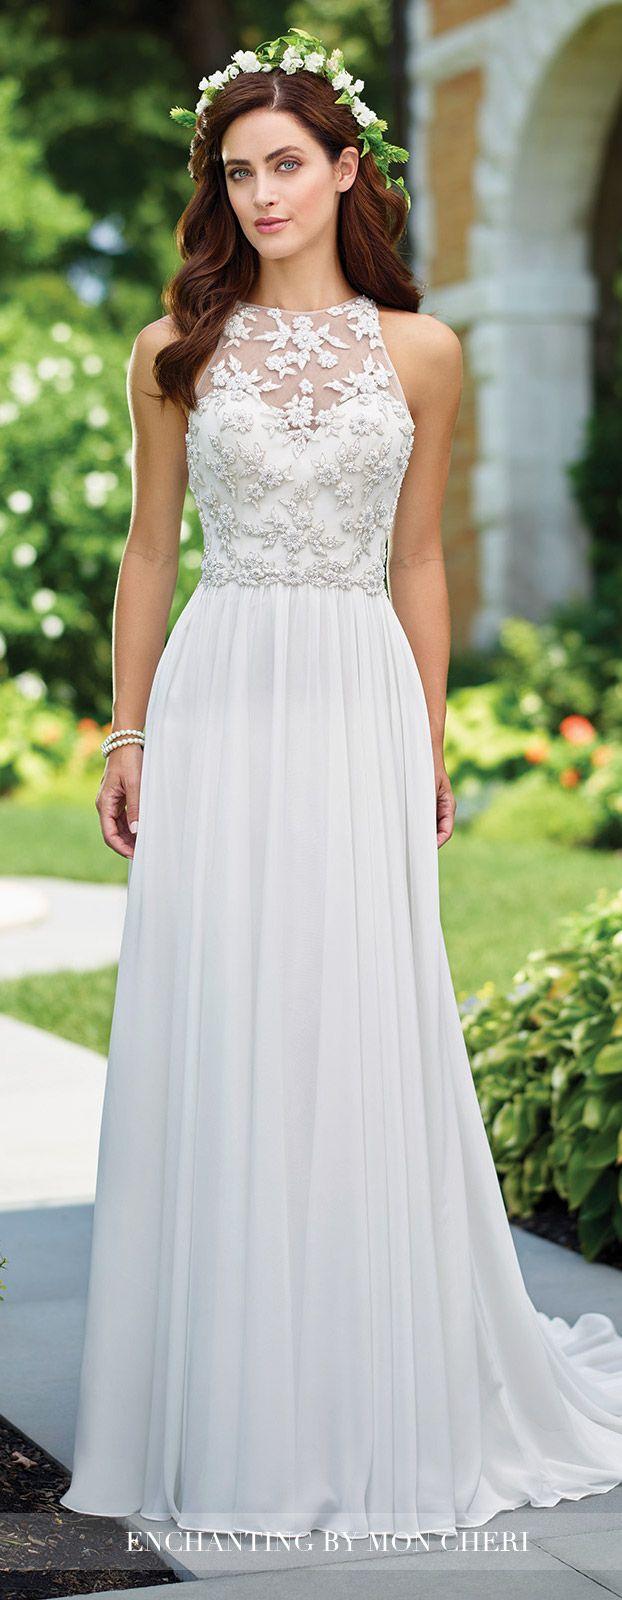 337 best wedding dresses images on Pinterest | Wedding bridesmaid ...